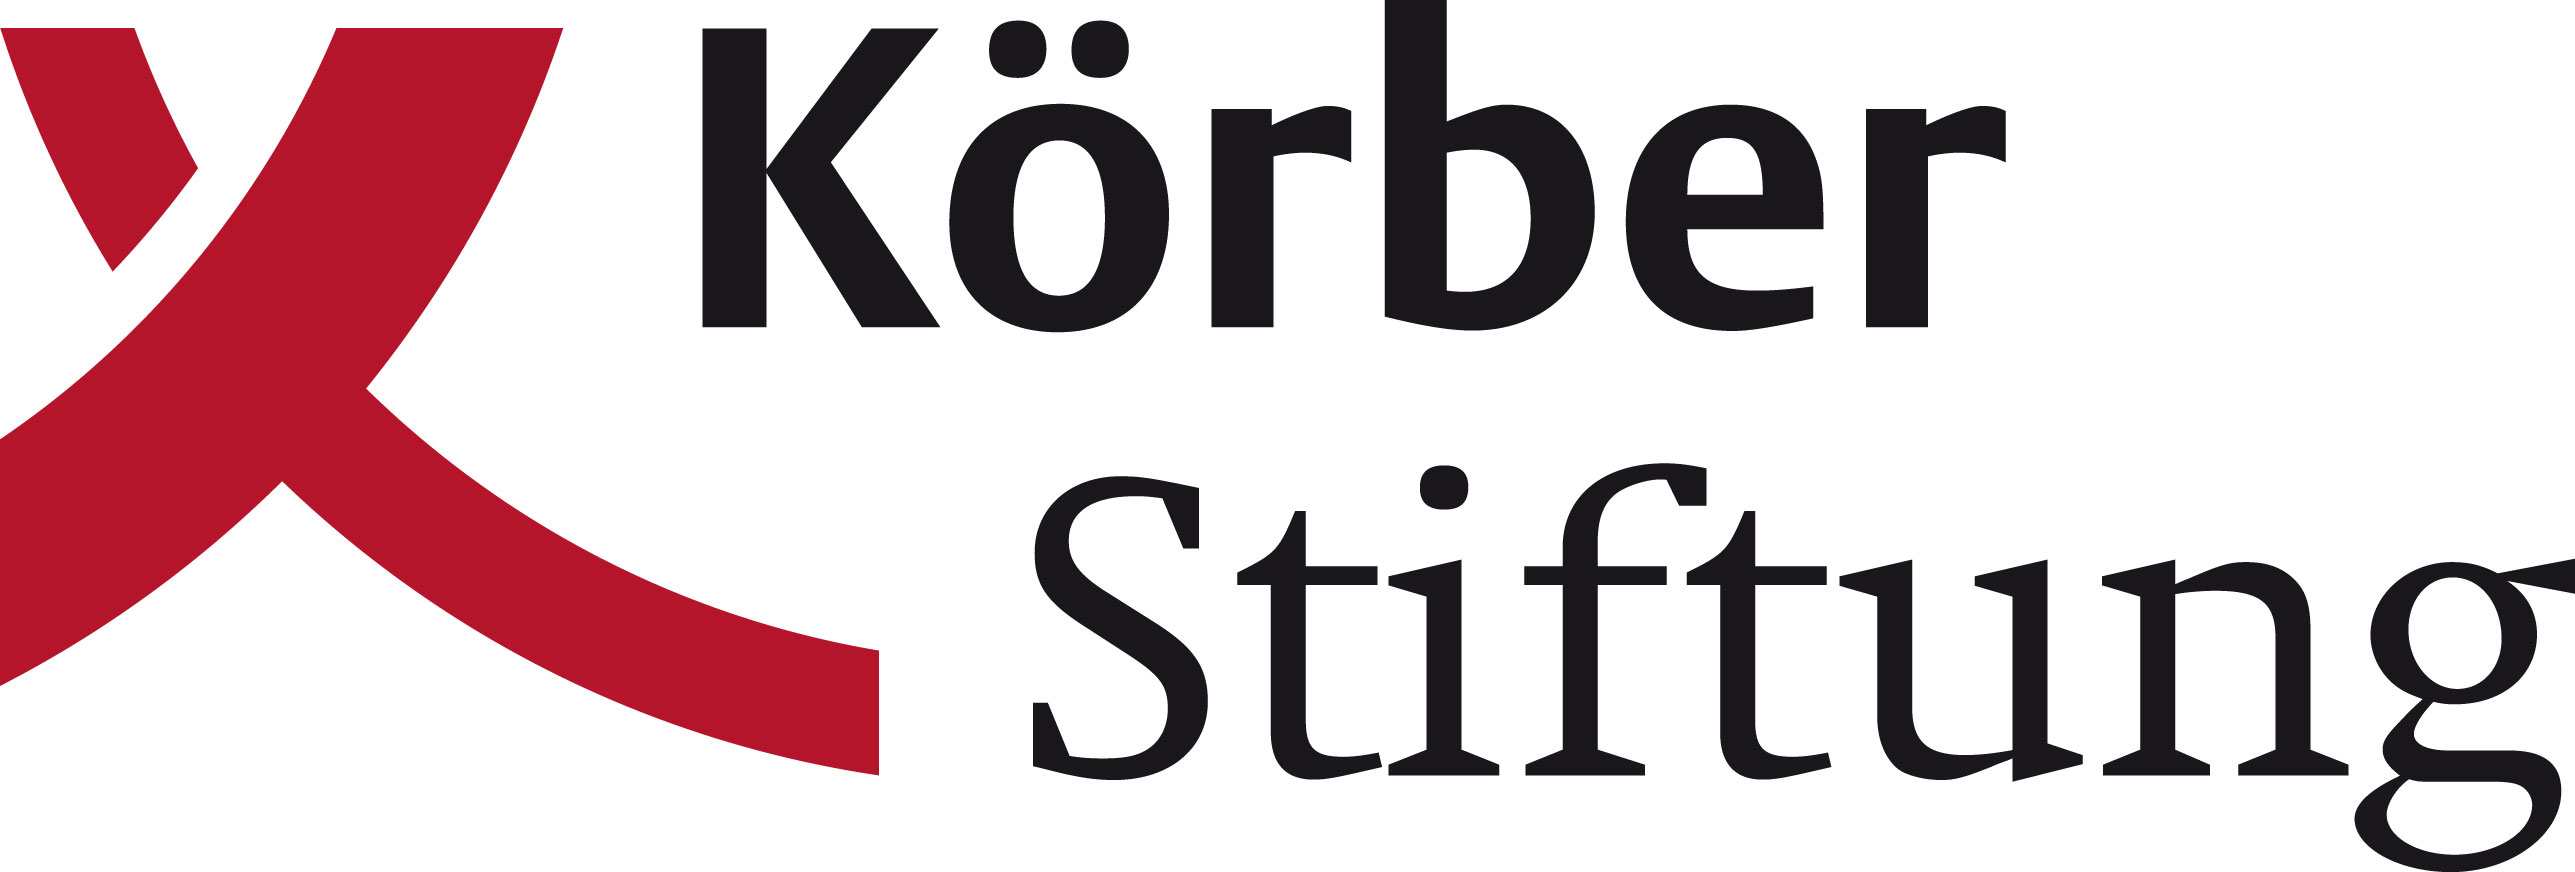 Koerber Stiftung